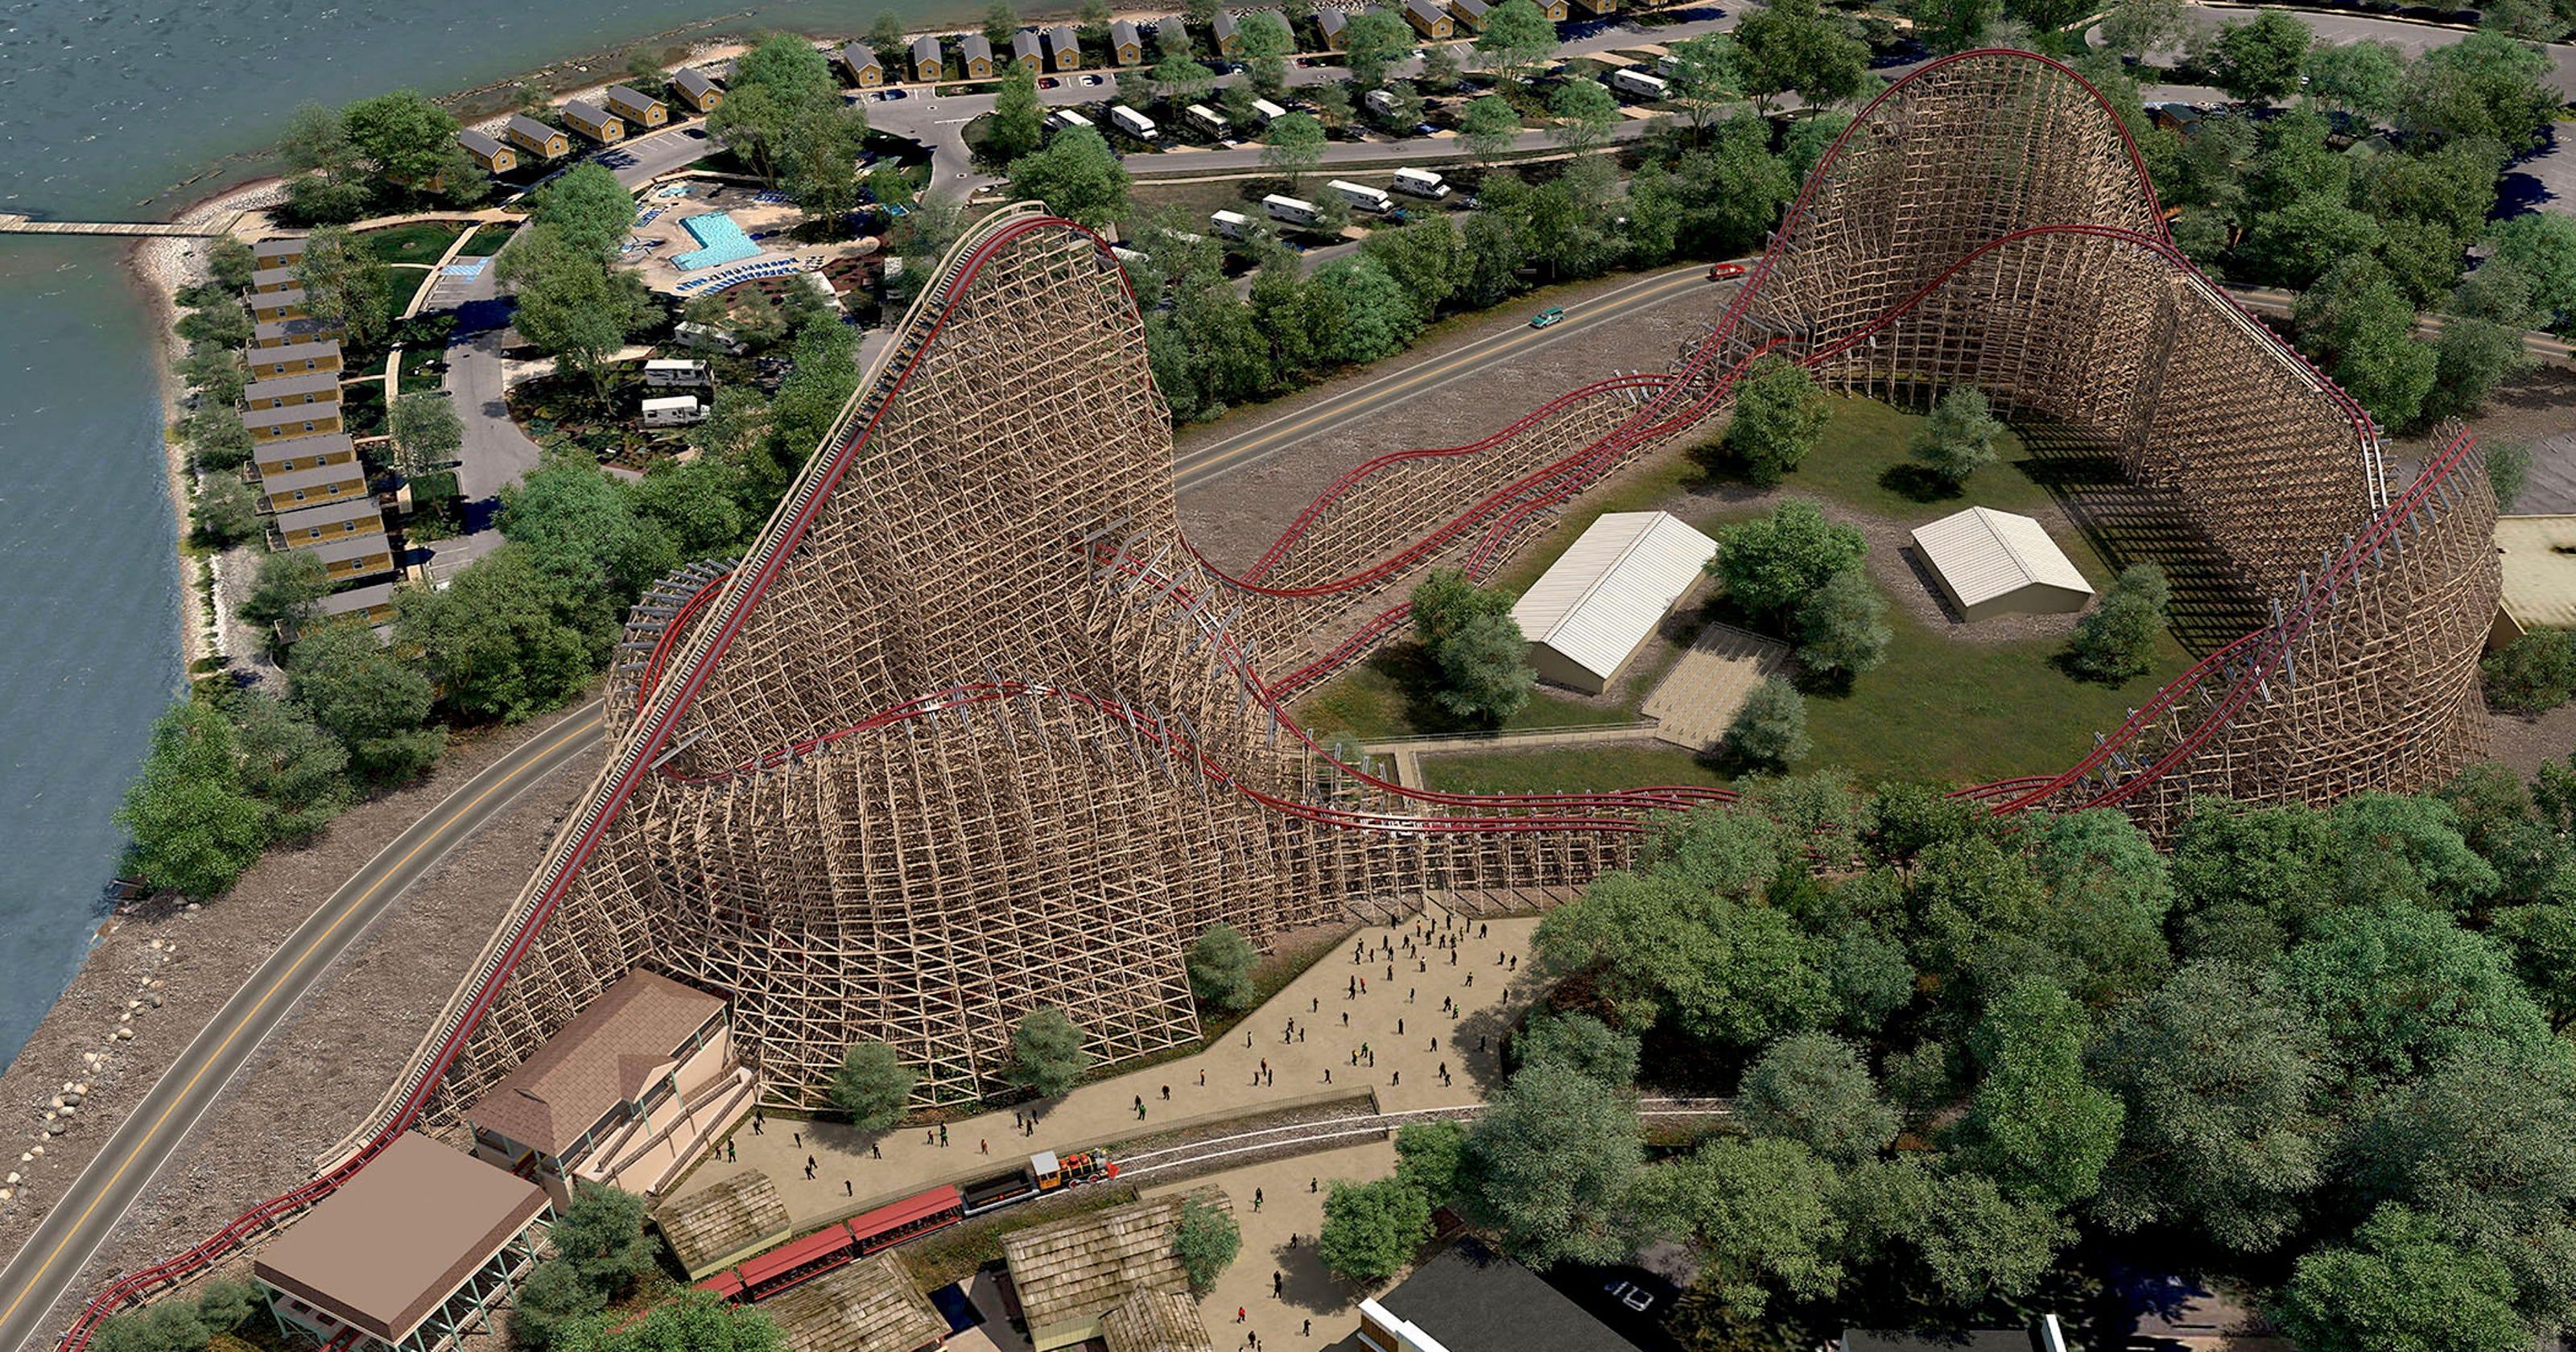 Cedar Point Announces New Steel Vengeance Roller Coaster